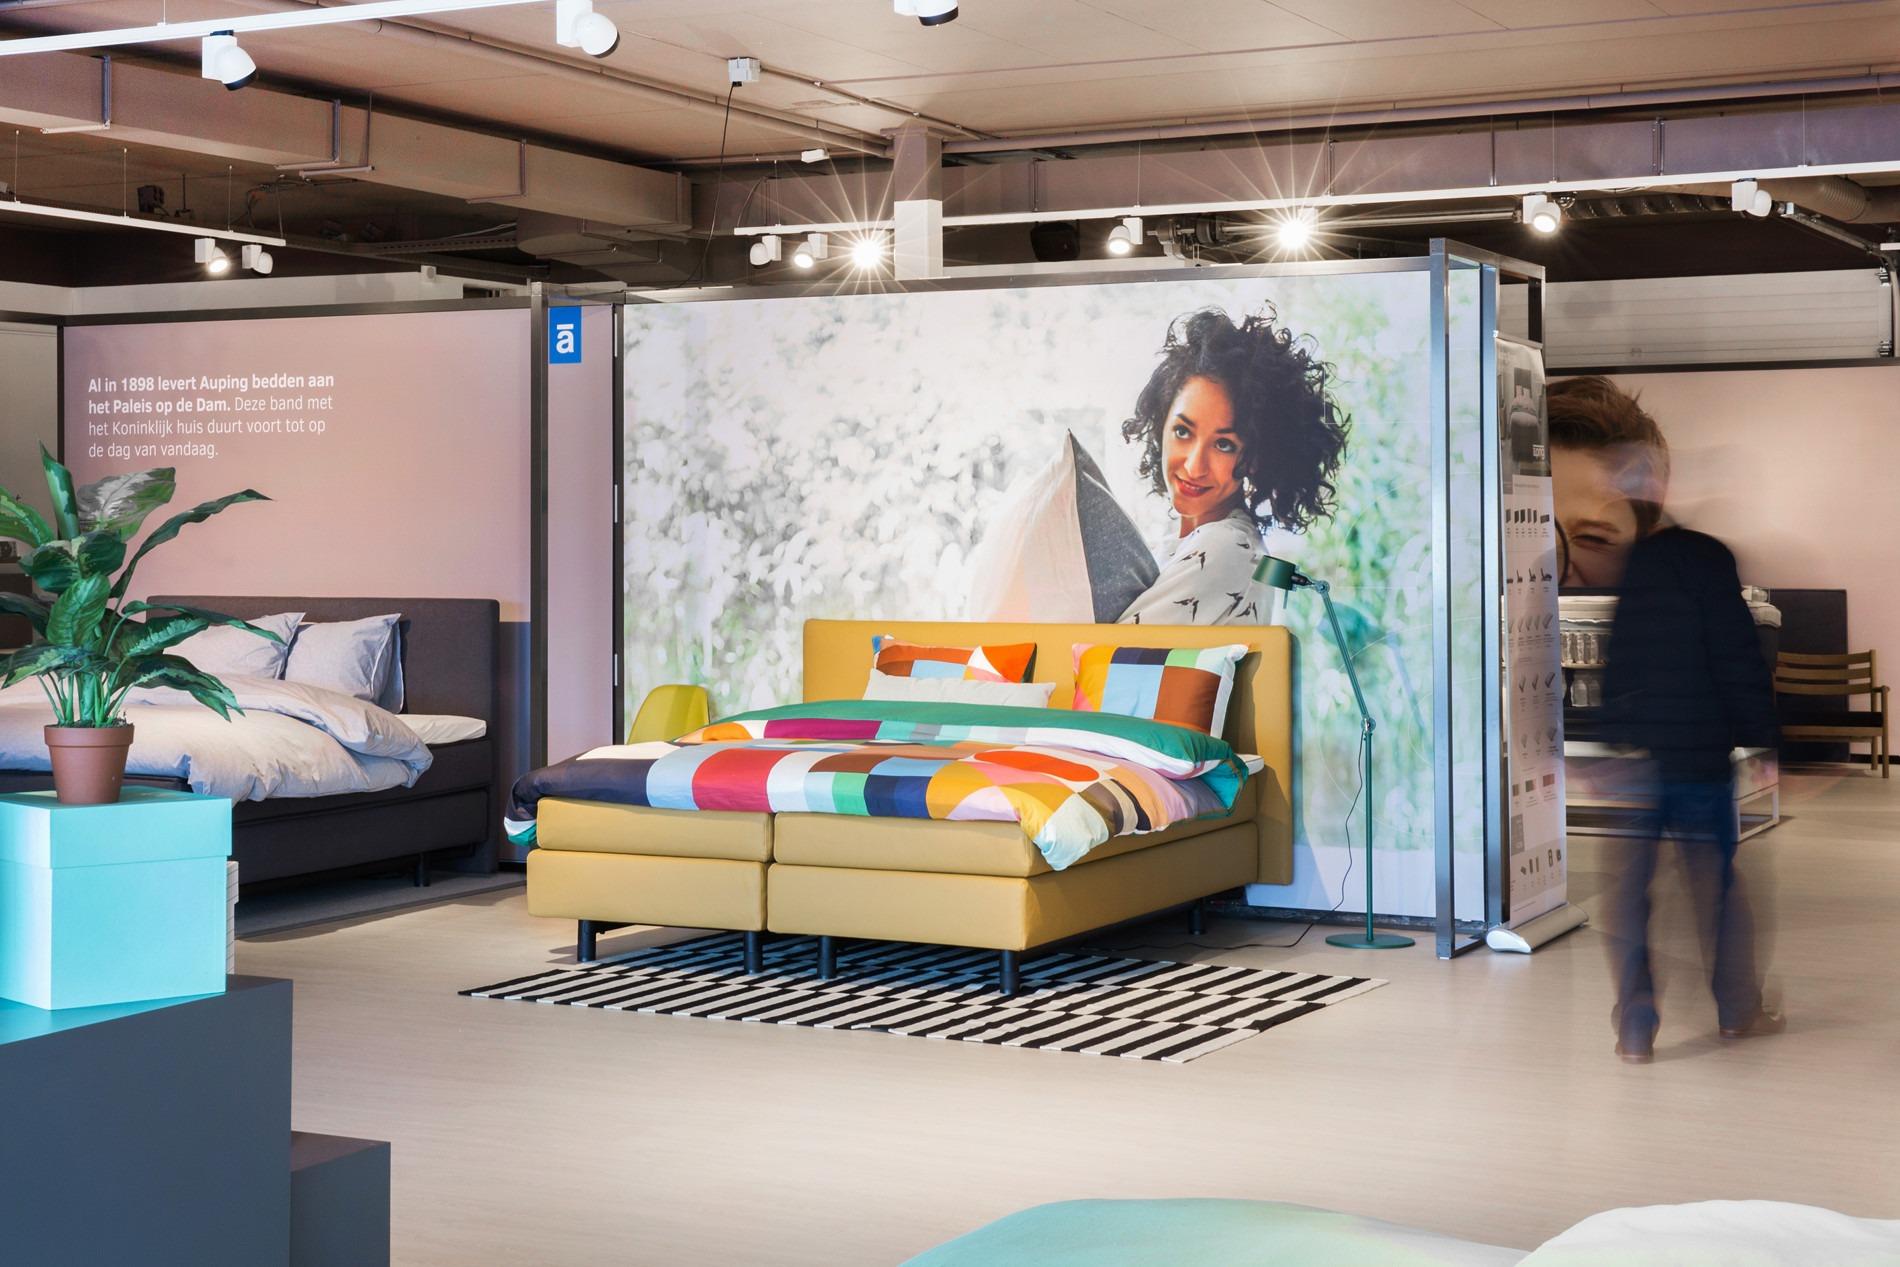 Complete Slaapkamer Nijmegen : Auping plaza nijmegen auping